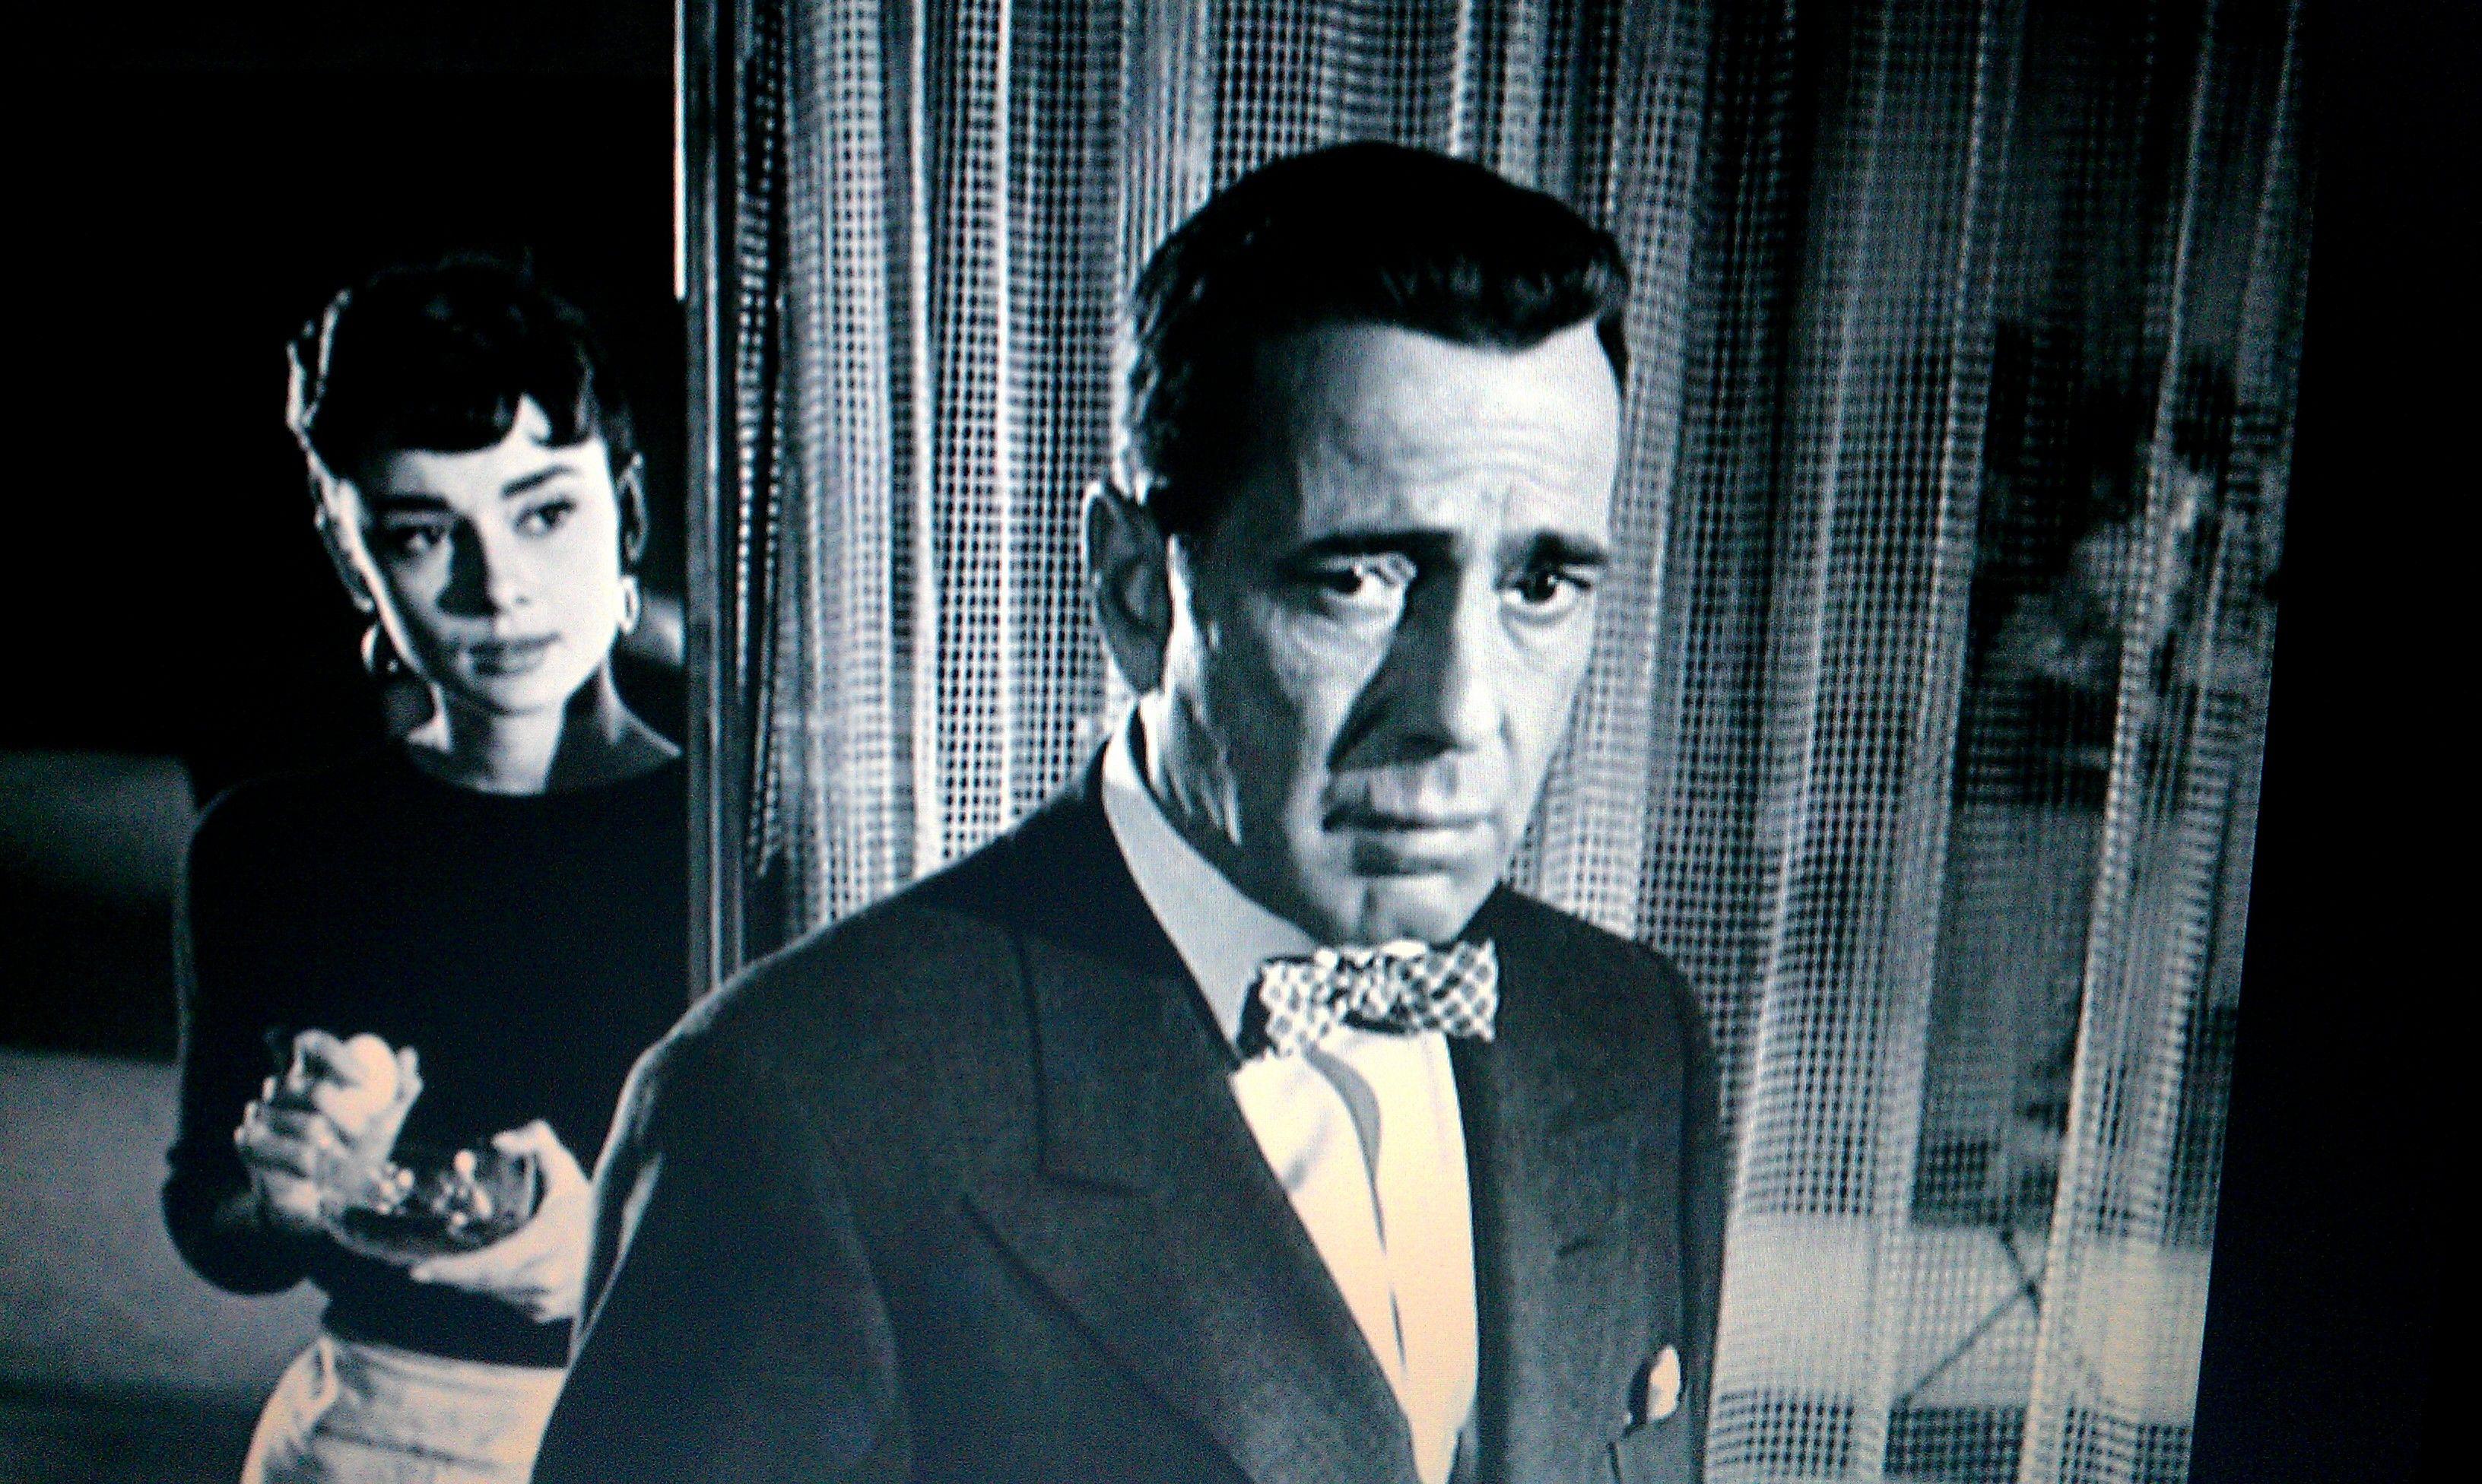 Audrey Hepburn y Humphrey Bogart en Sabrina Humphrey bogart